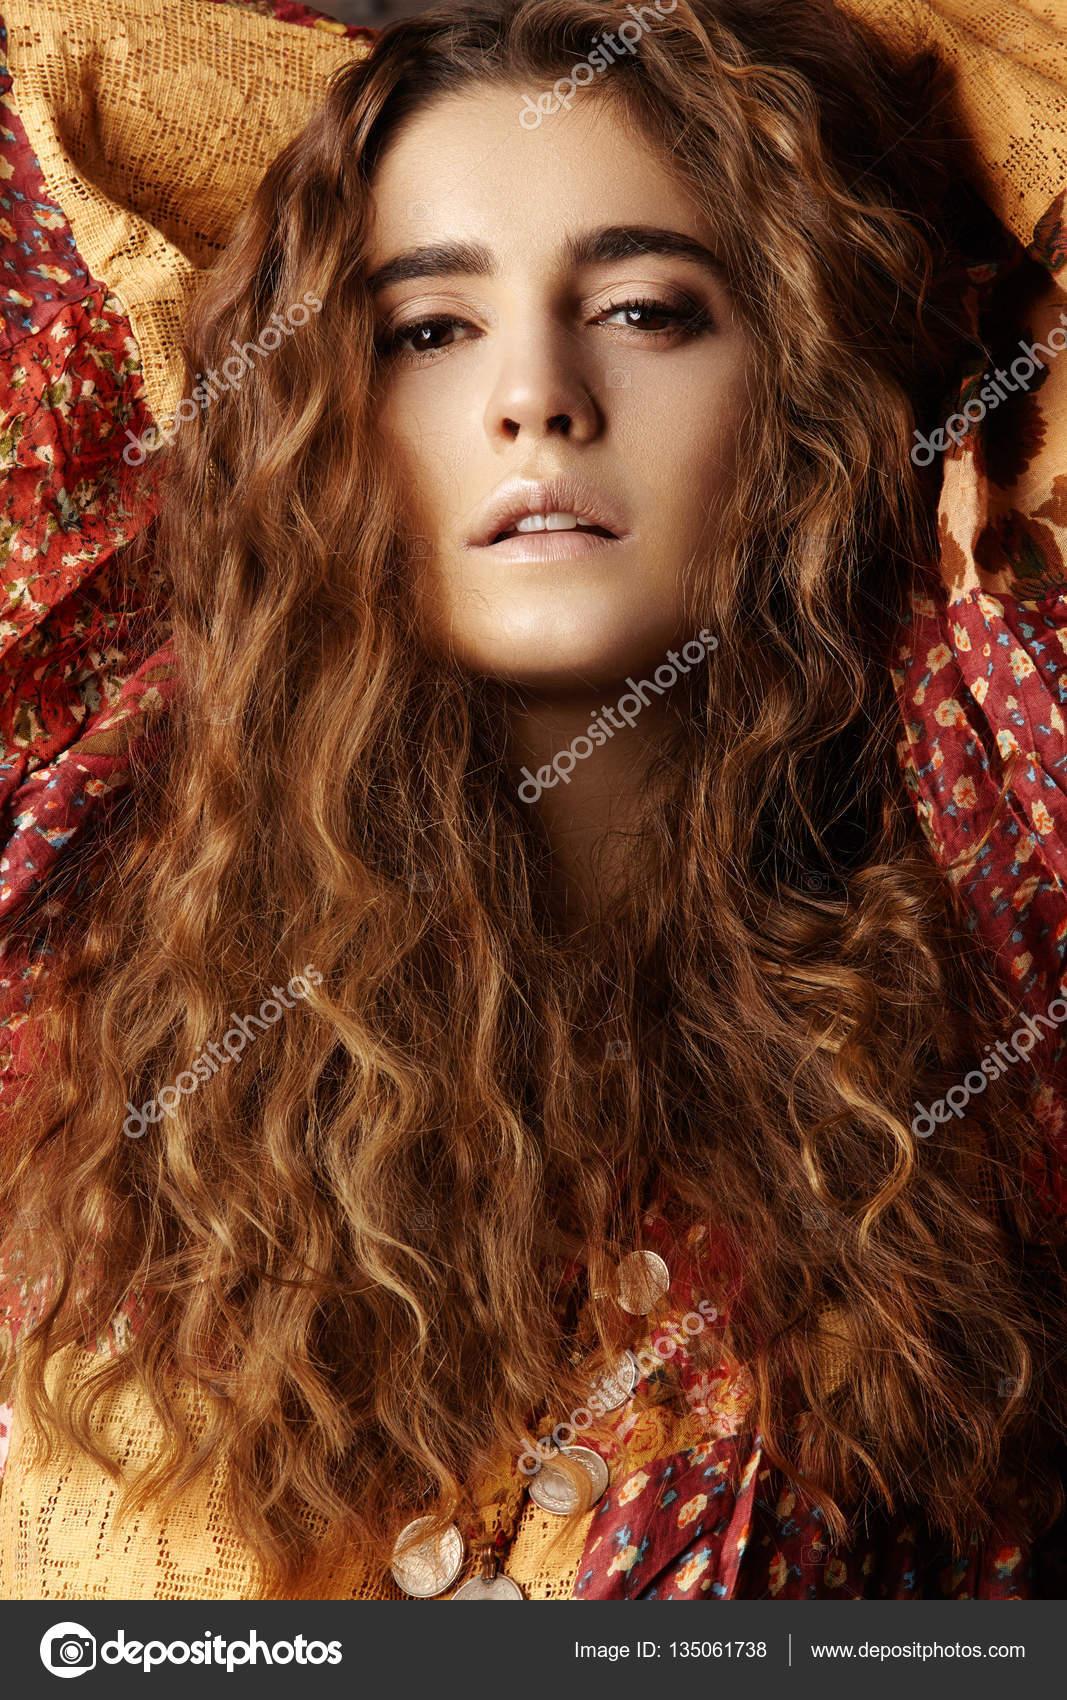 Chica Morena Con Cabello Ondulado Largo Y Brillante Preciosa Modelo